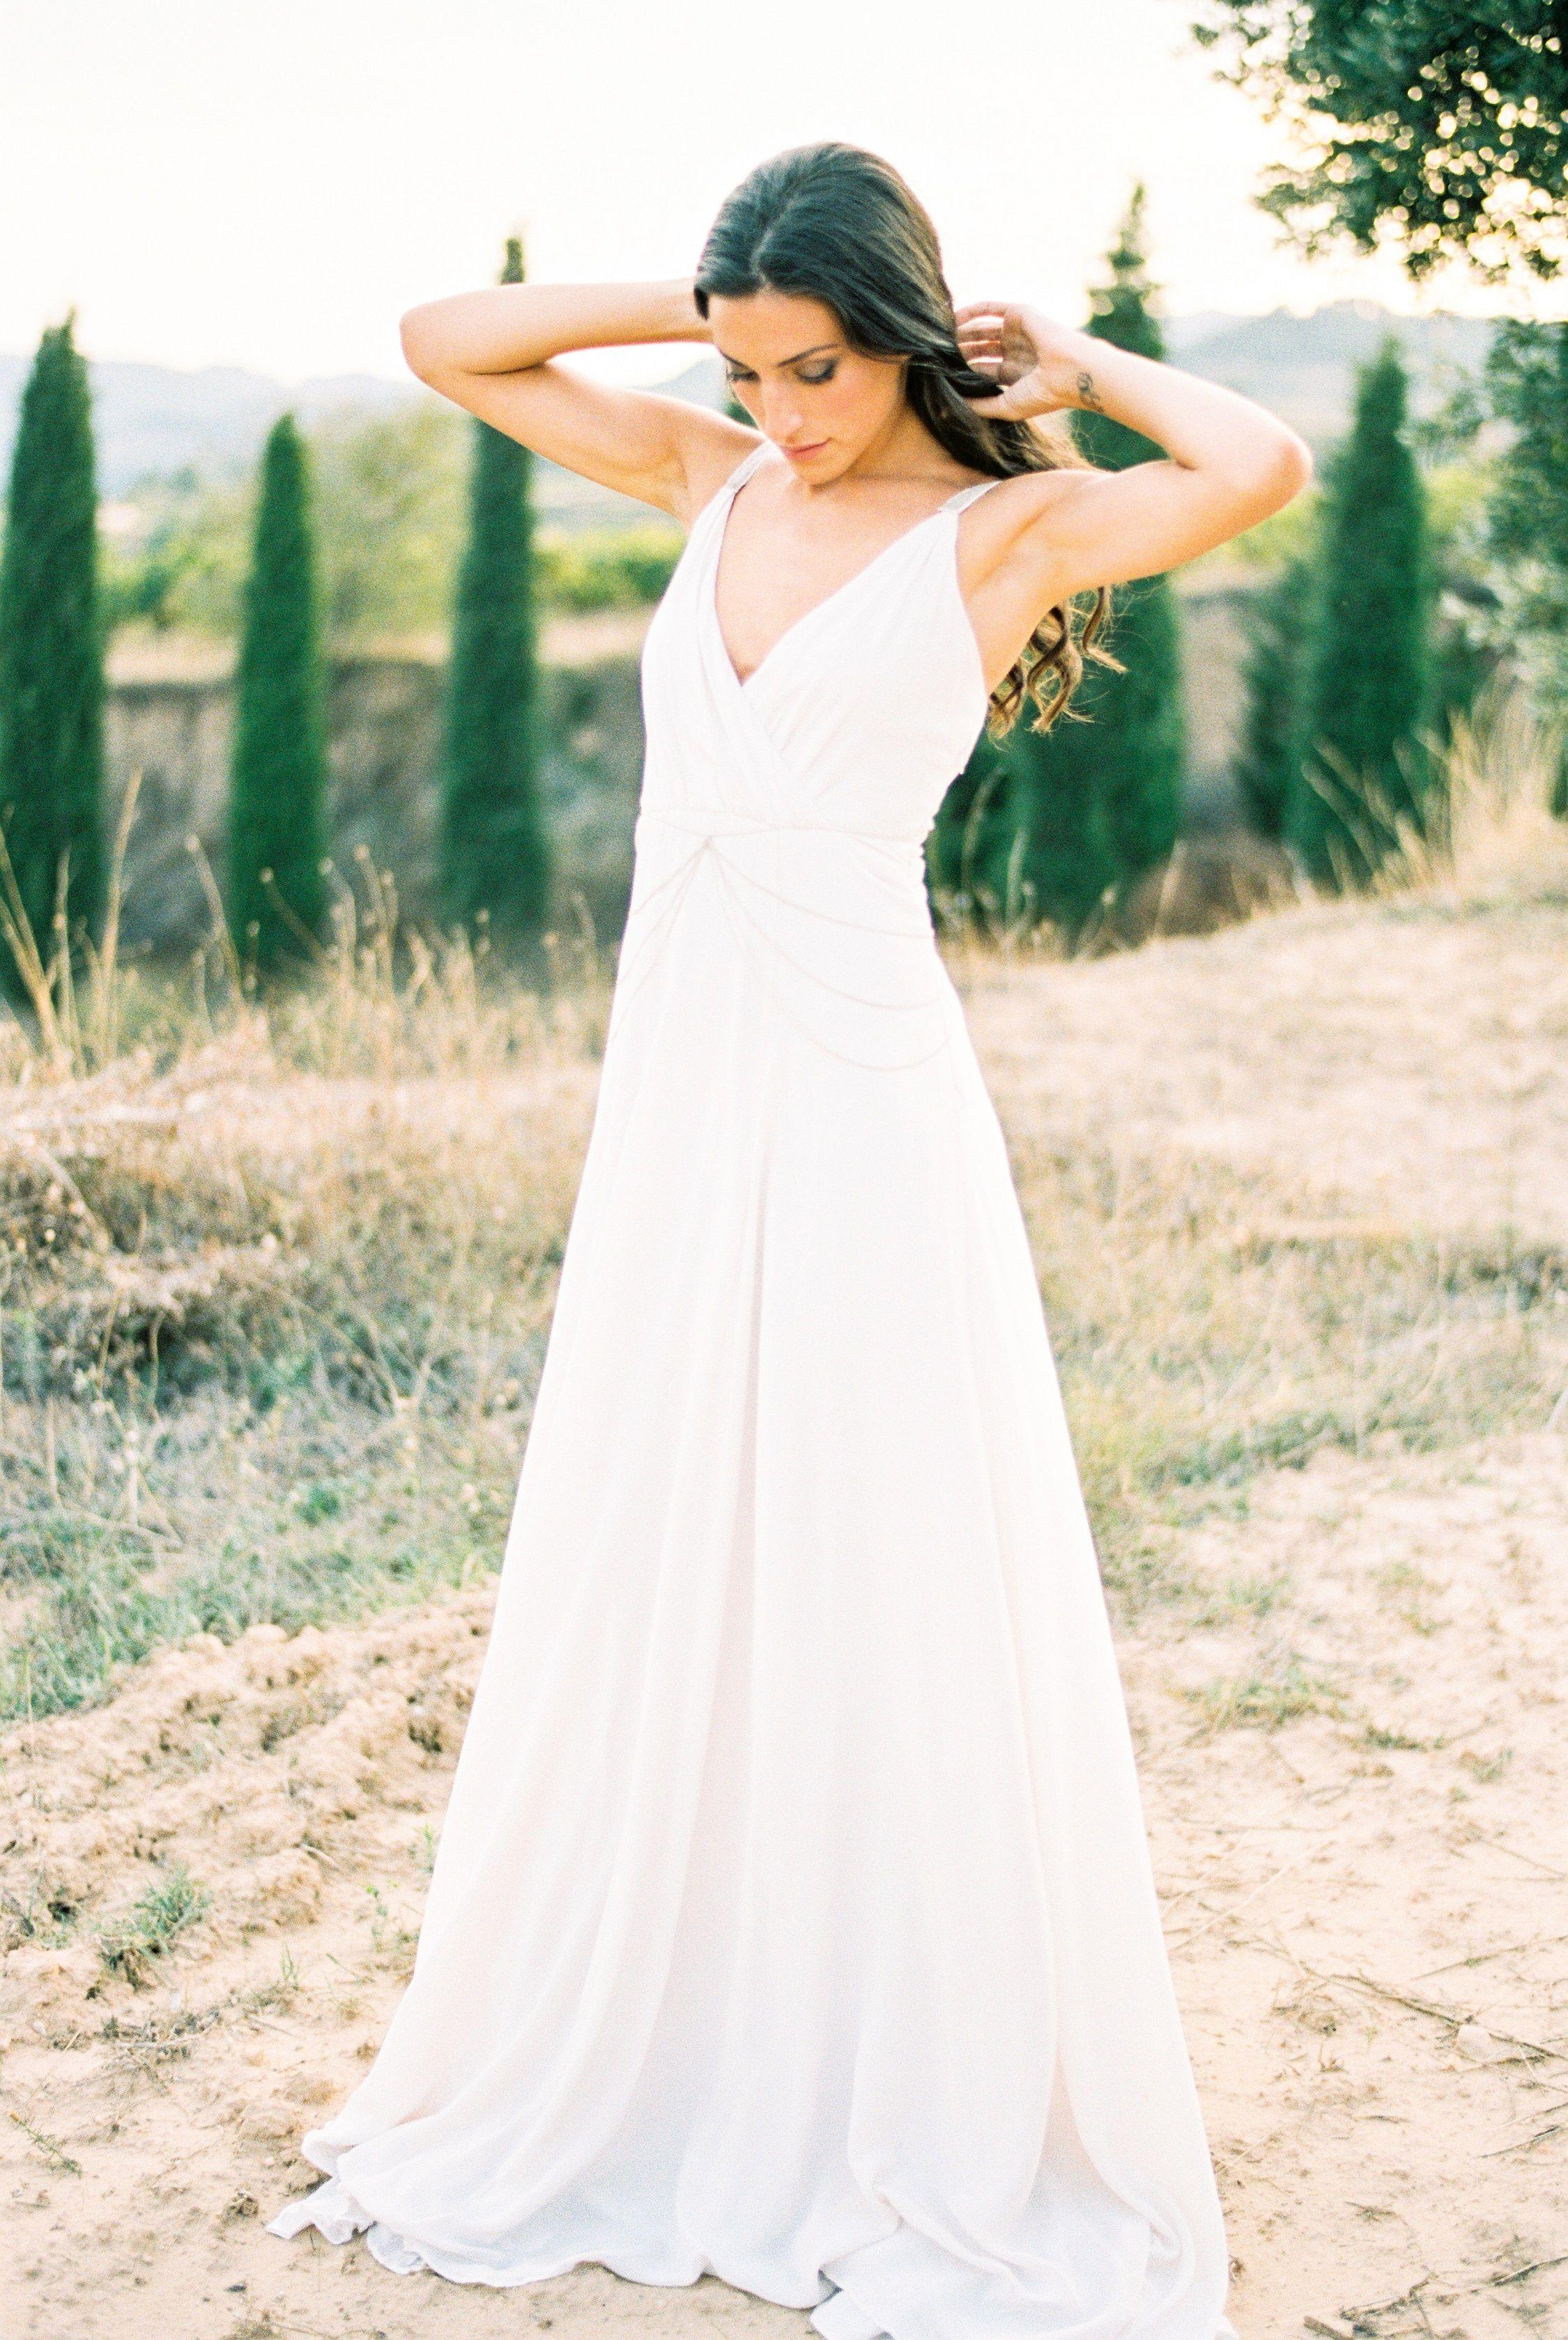 Lilliana wedding dress. Blush. Low back. No back. Chain straps ...